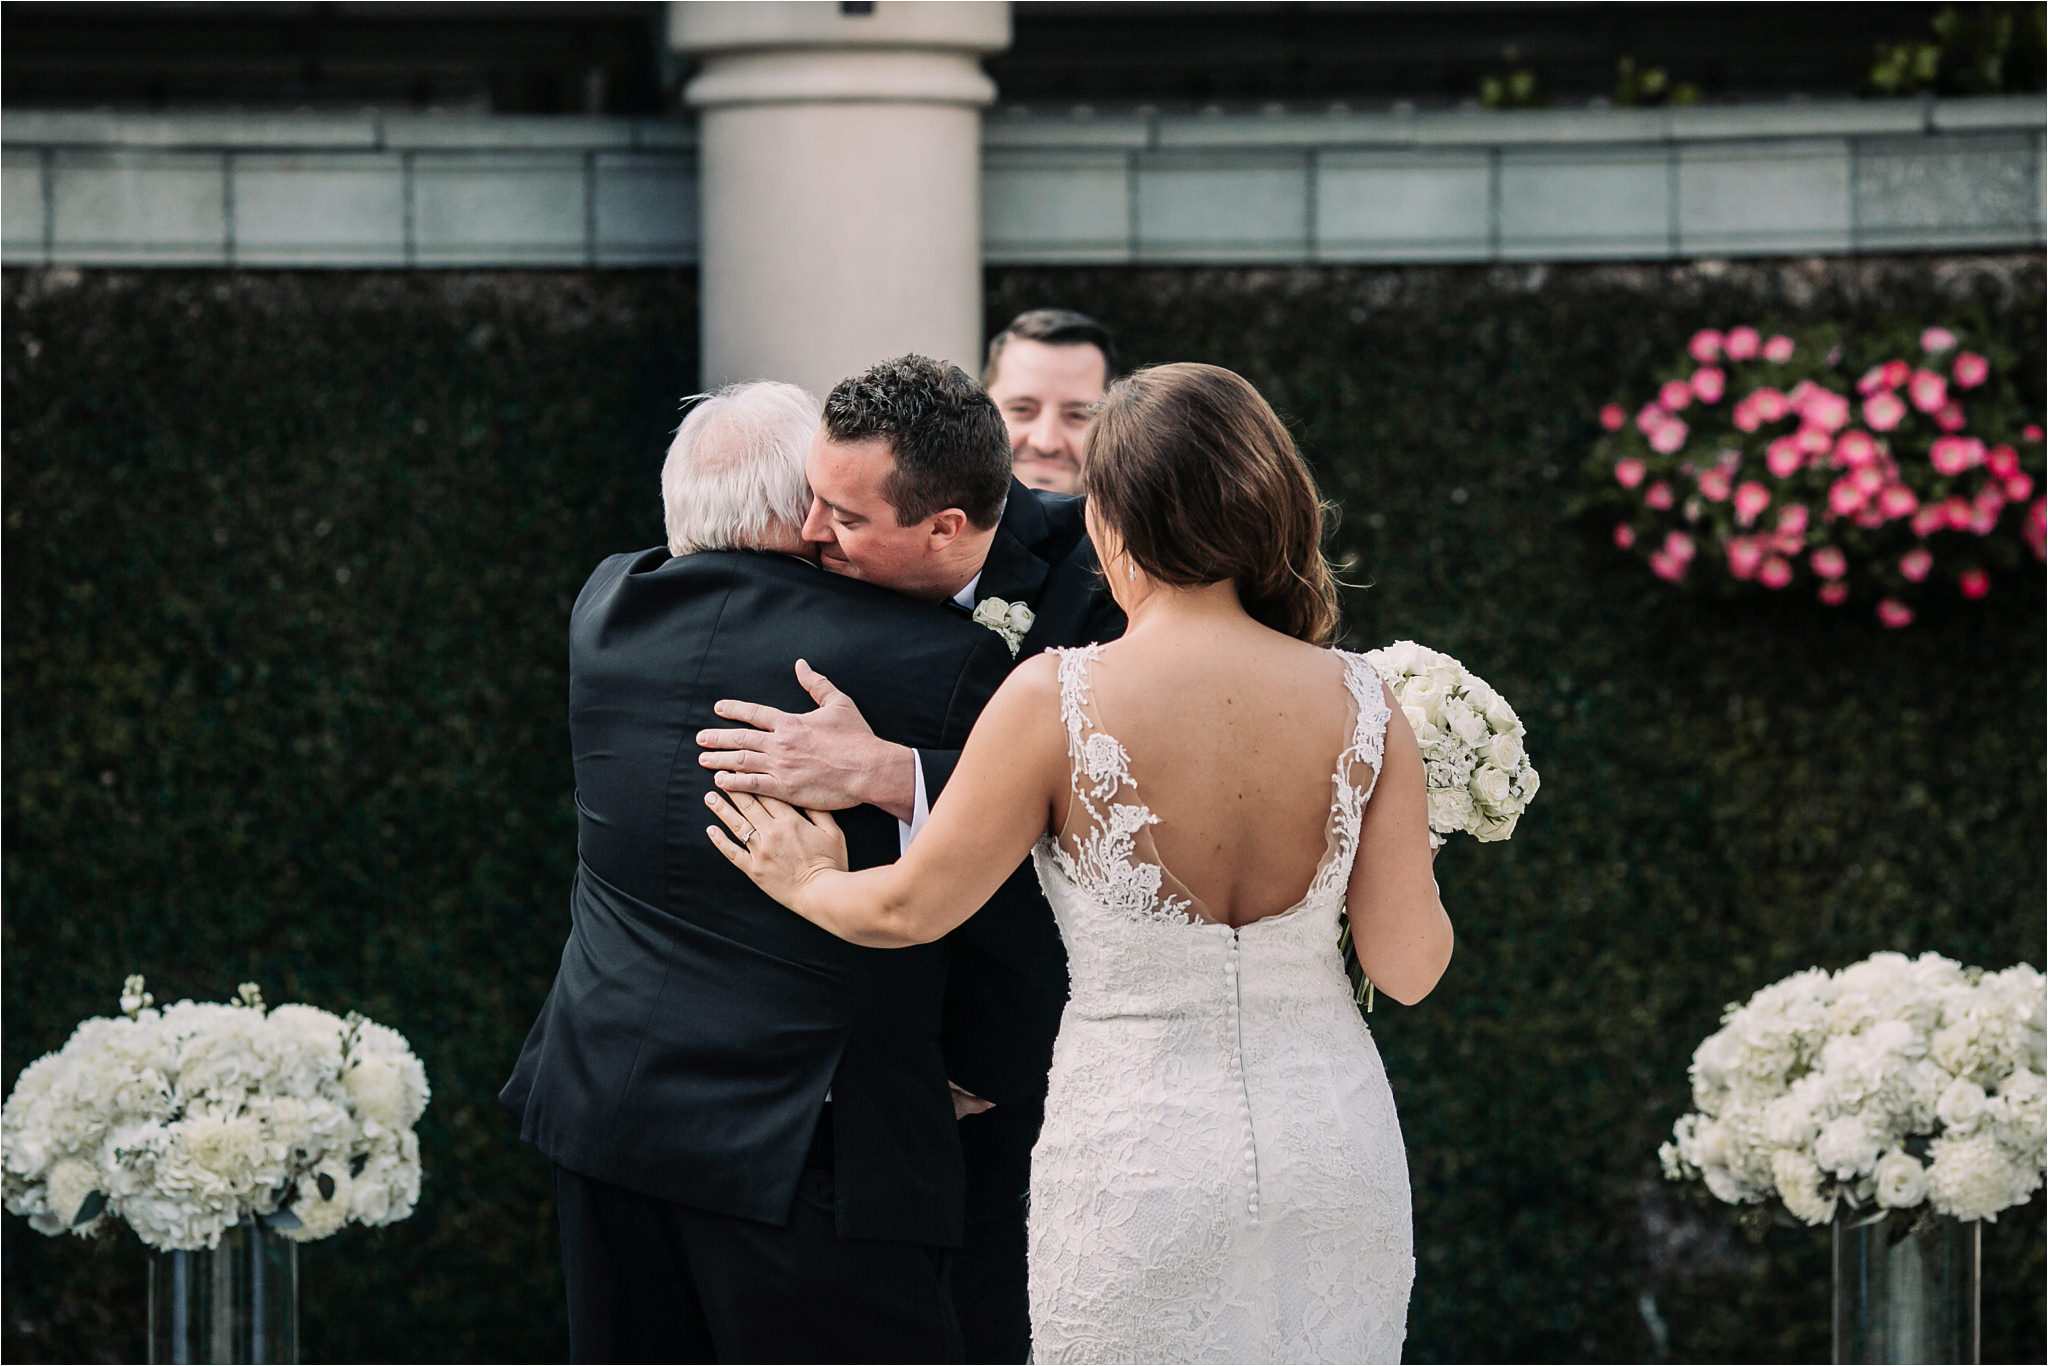 jessica-roman-photography-arden hills wedding photograpger-sacramento-boise-23.jpg